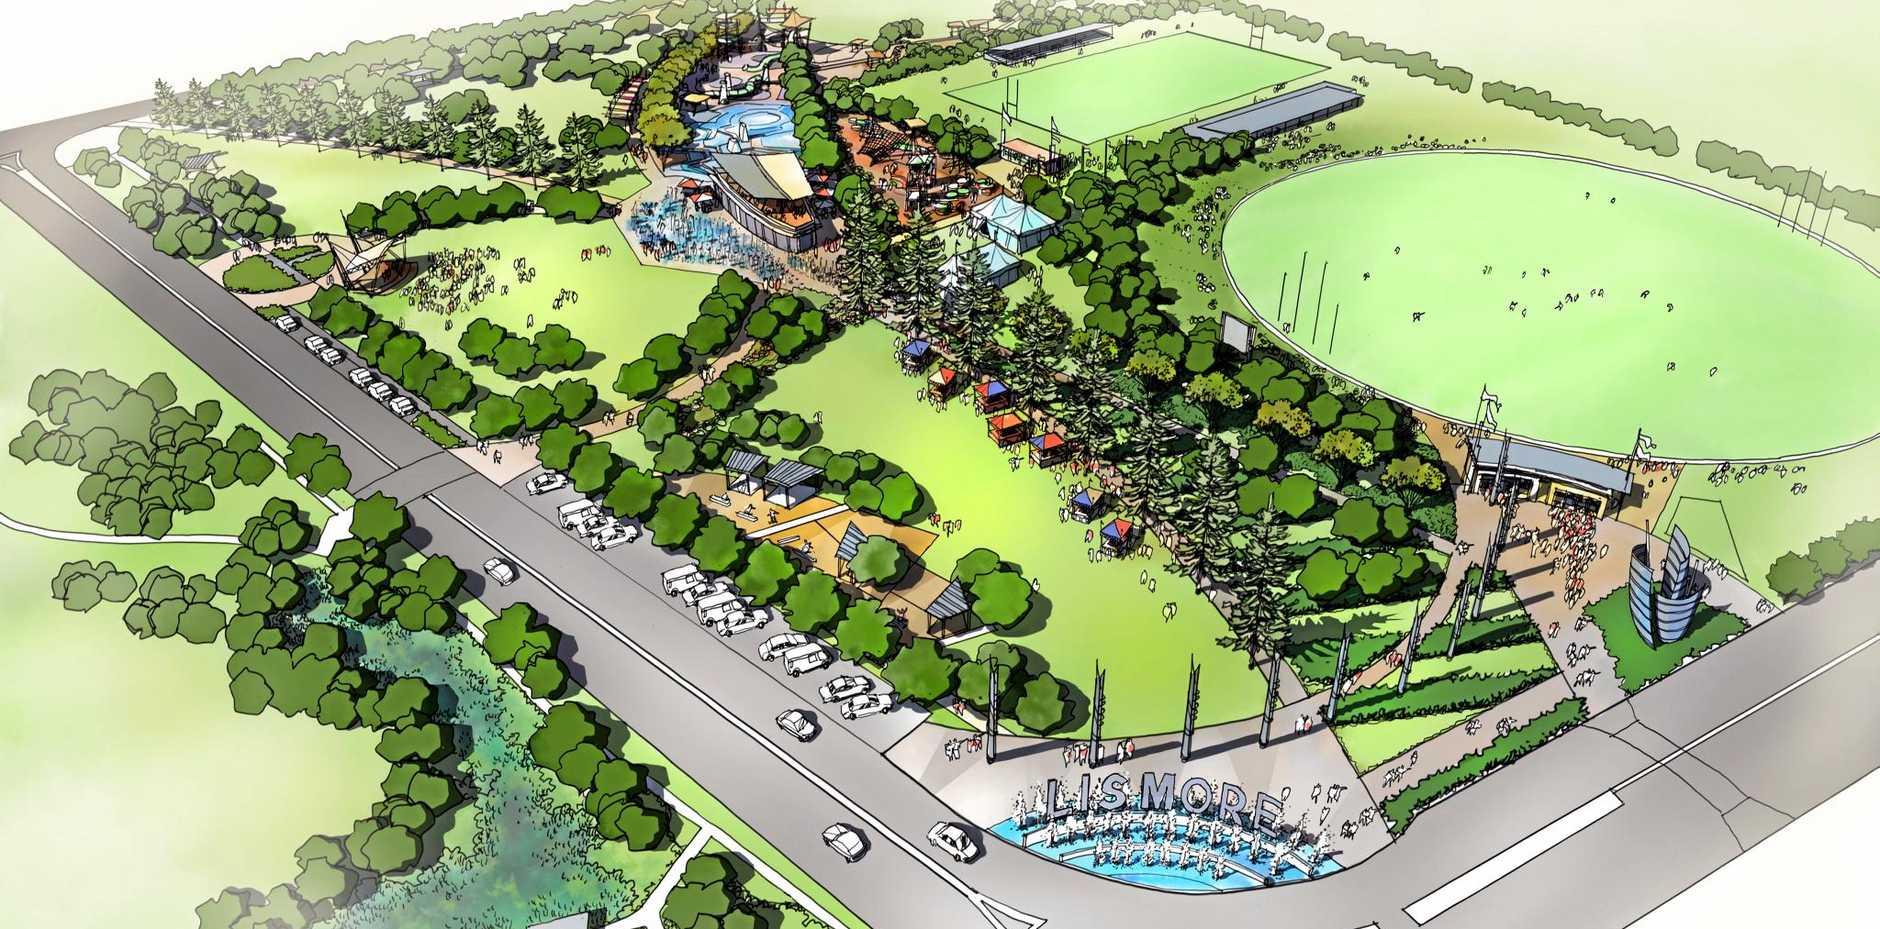 LISMORE PARK: Plans for the $21.5 million plan for Lismore's own 'central park'.